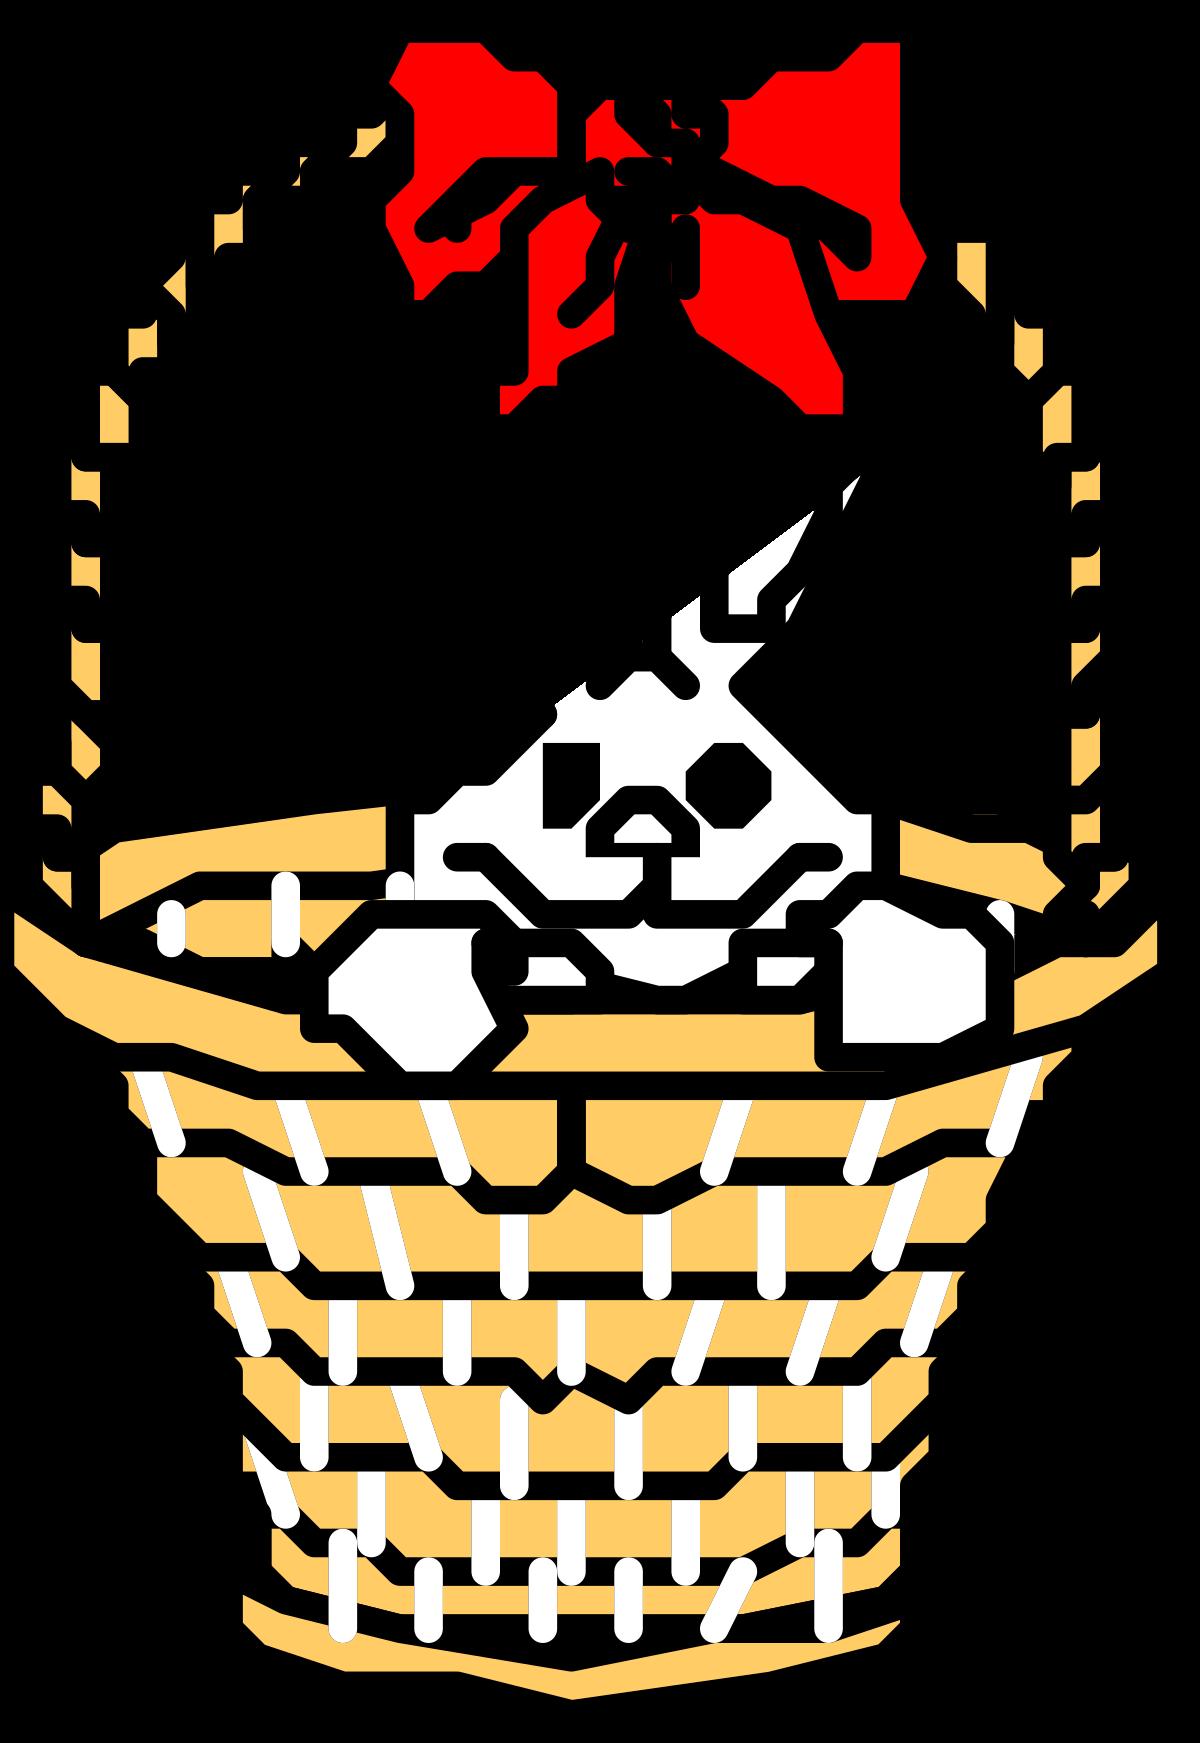 Vector Illustration Basket Symbol Gift Decoration Backgrounds Computer Graphic Sign Christmas Food Celebration Isolated Business Design